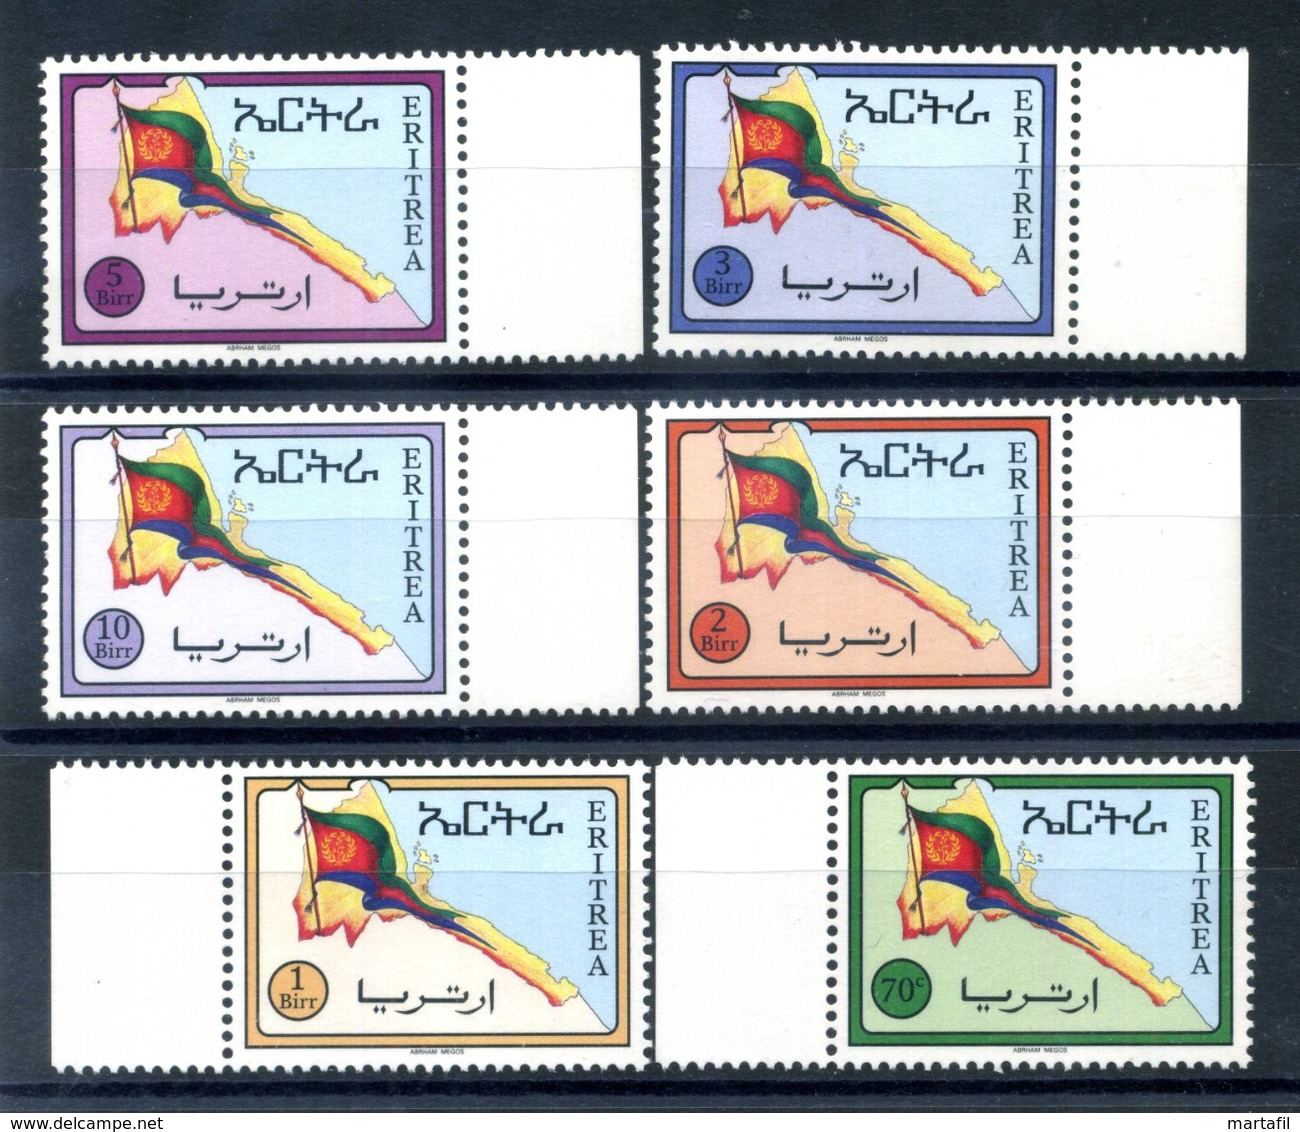 1994 ERITREA 244/249 MNH ** - Eritrea